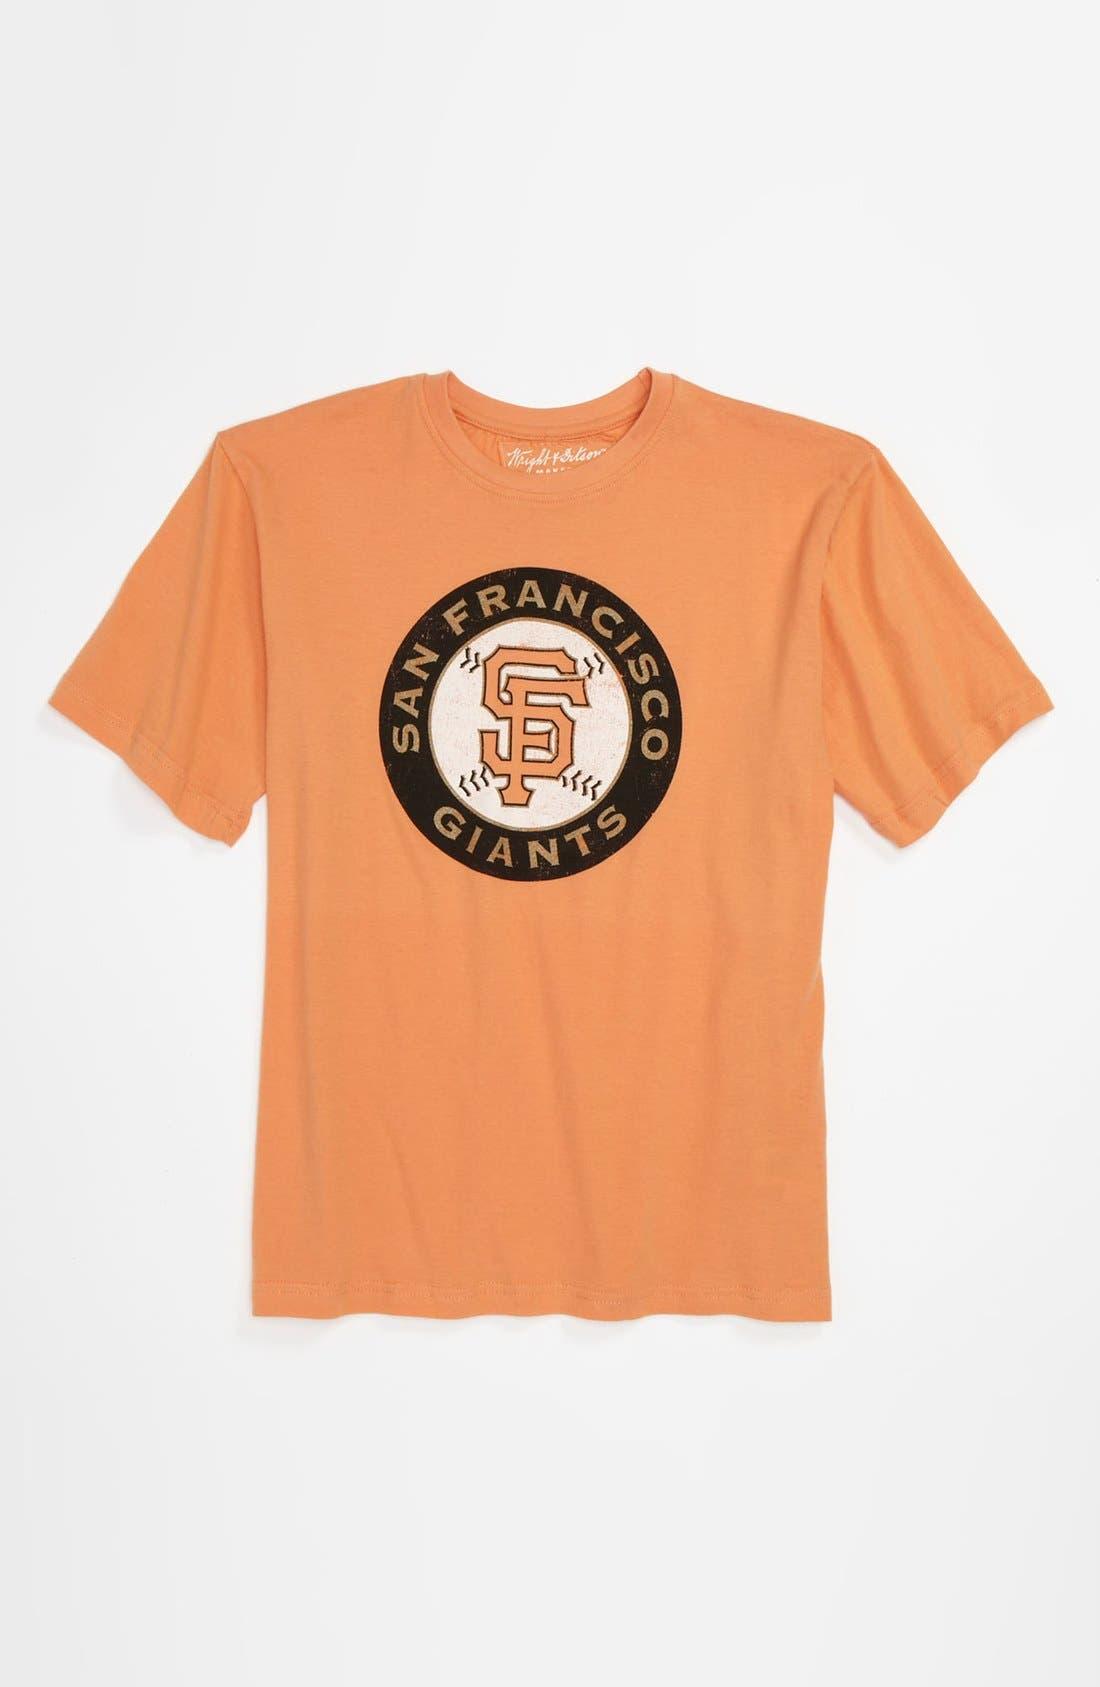 Alternate Image 1 Selected - Wright & Ditson 'San Francisco Giants' T-Shirt (Little Boys & Big Boys)